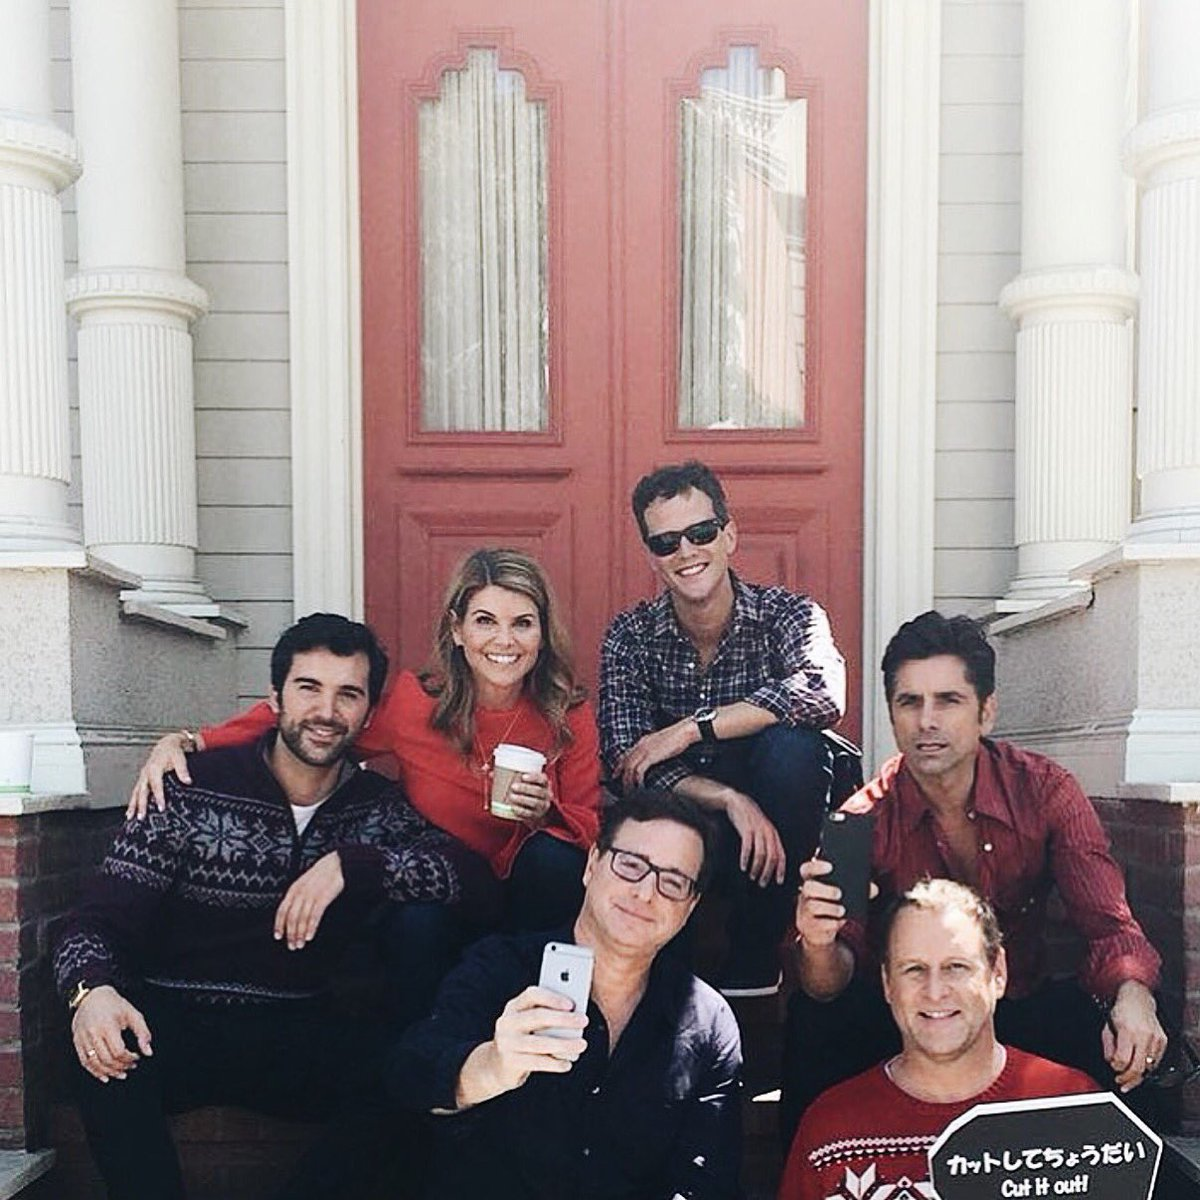 Lori & her gang of misfits. #FullerHouse #Squad {